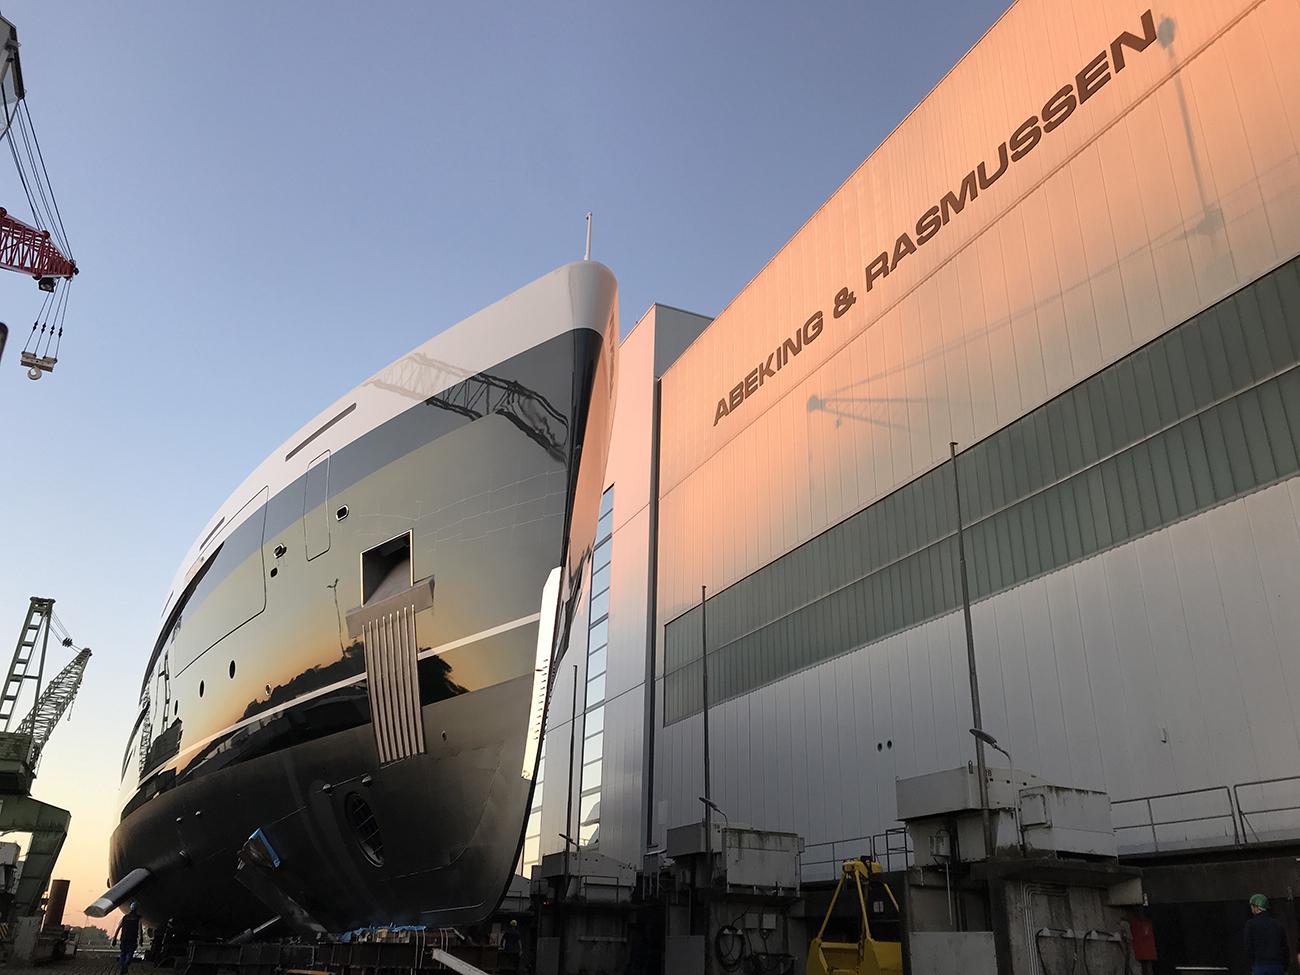 Abeking & Rasmussen Yacht 74M